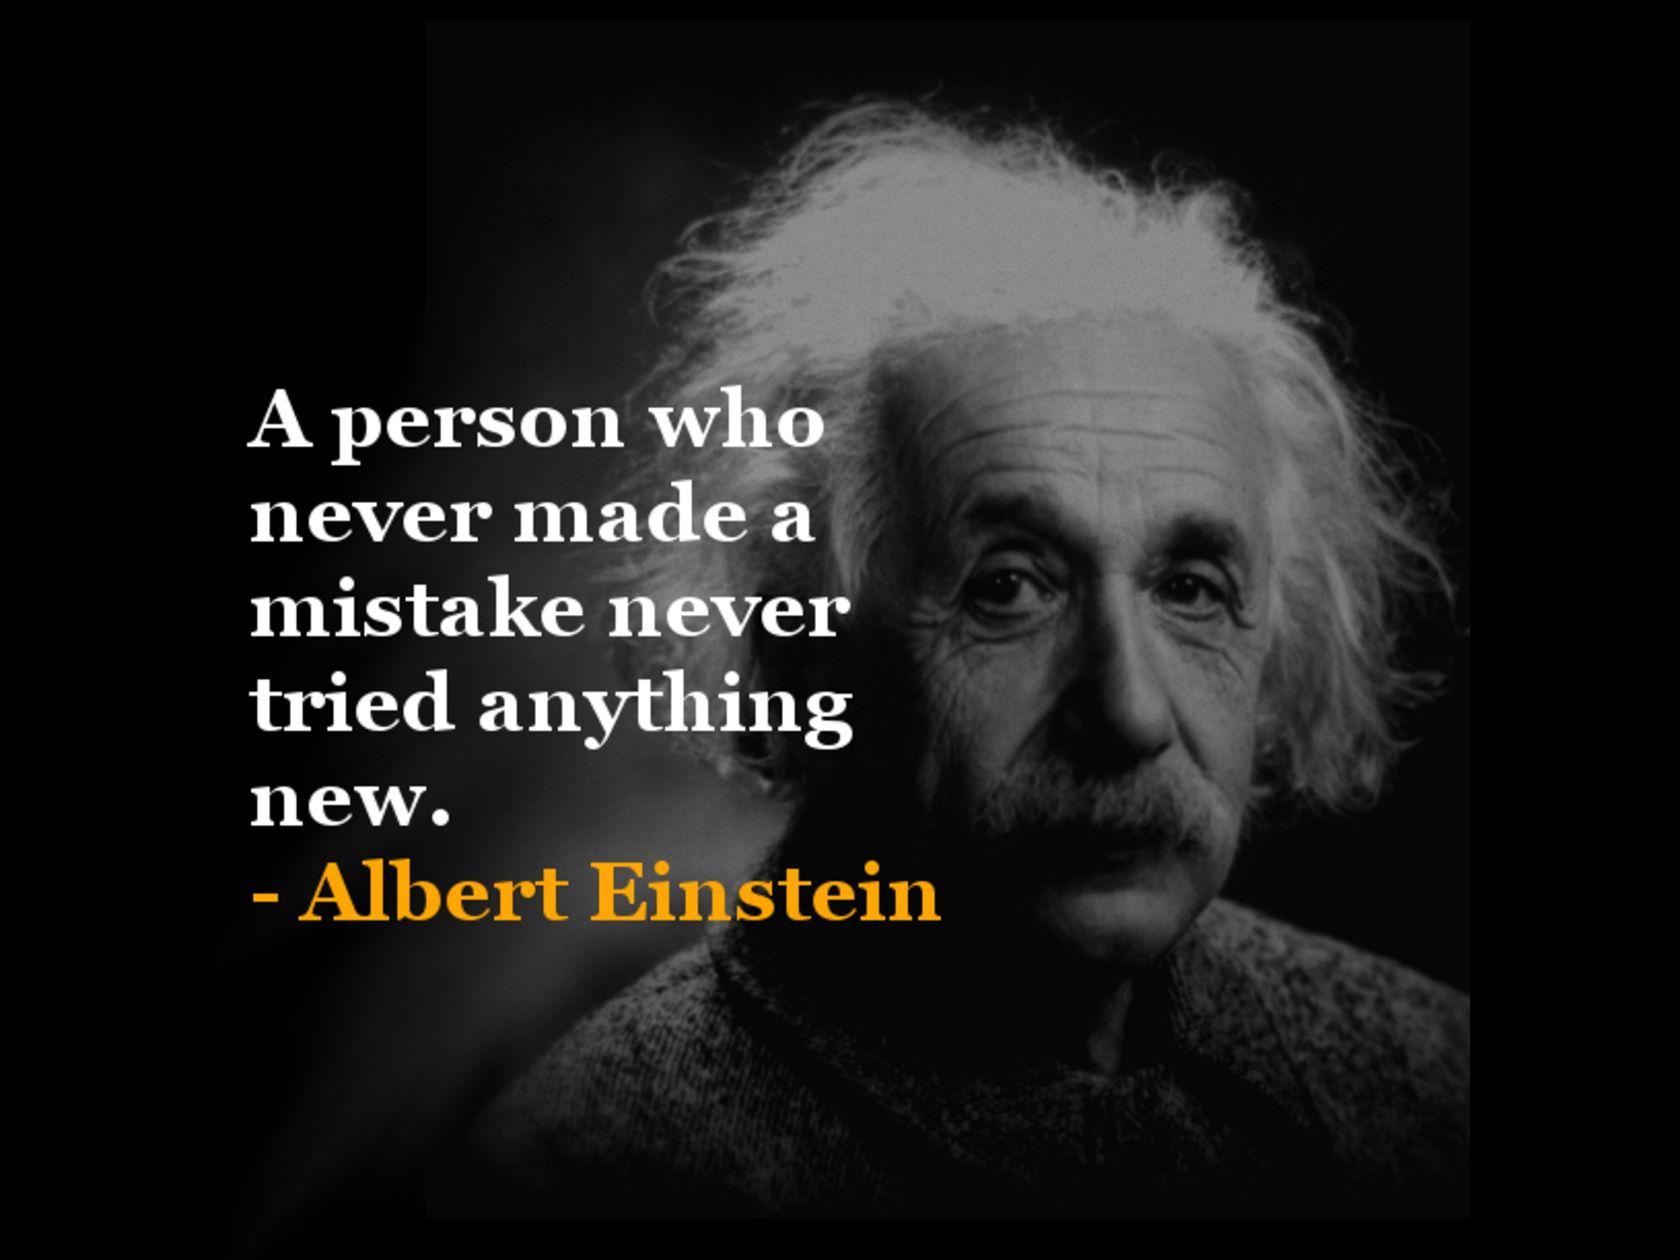 Albert Einstein Famous Quotes With Images - MagMent  Einstein